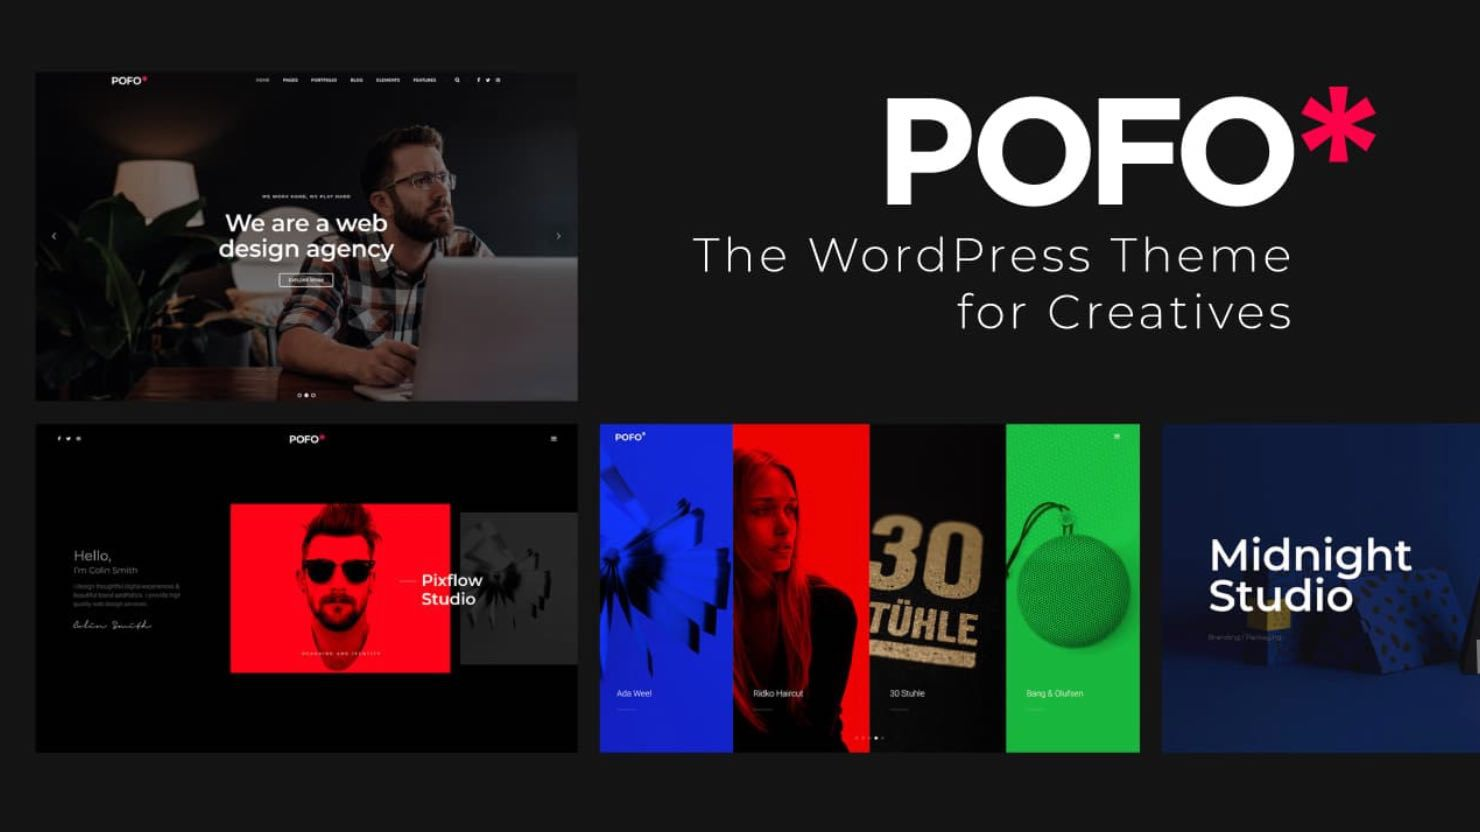 WordPress theme for creatives